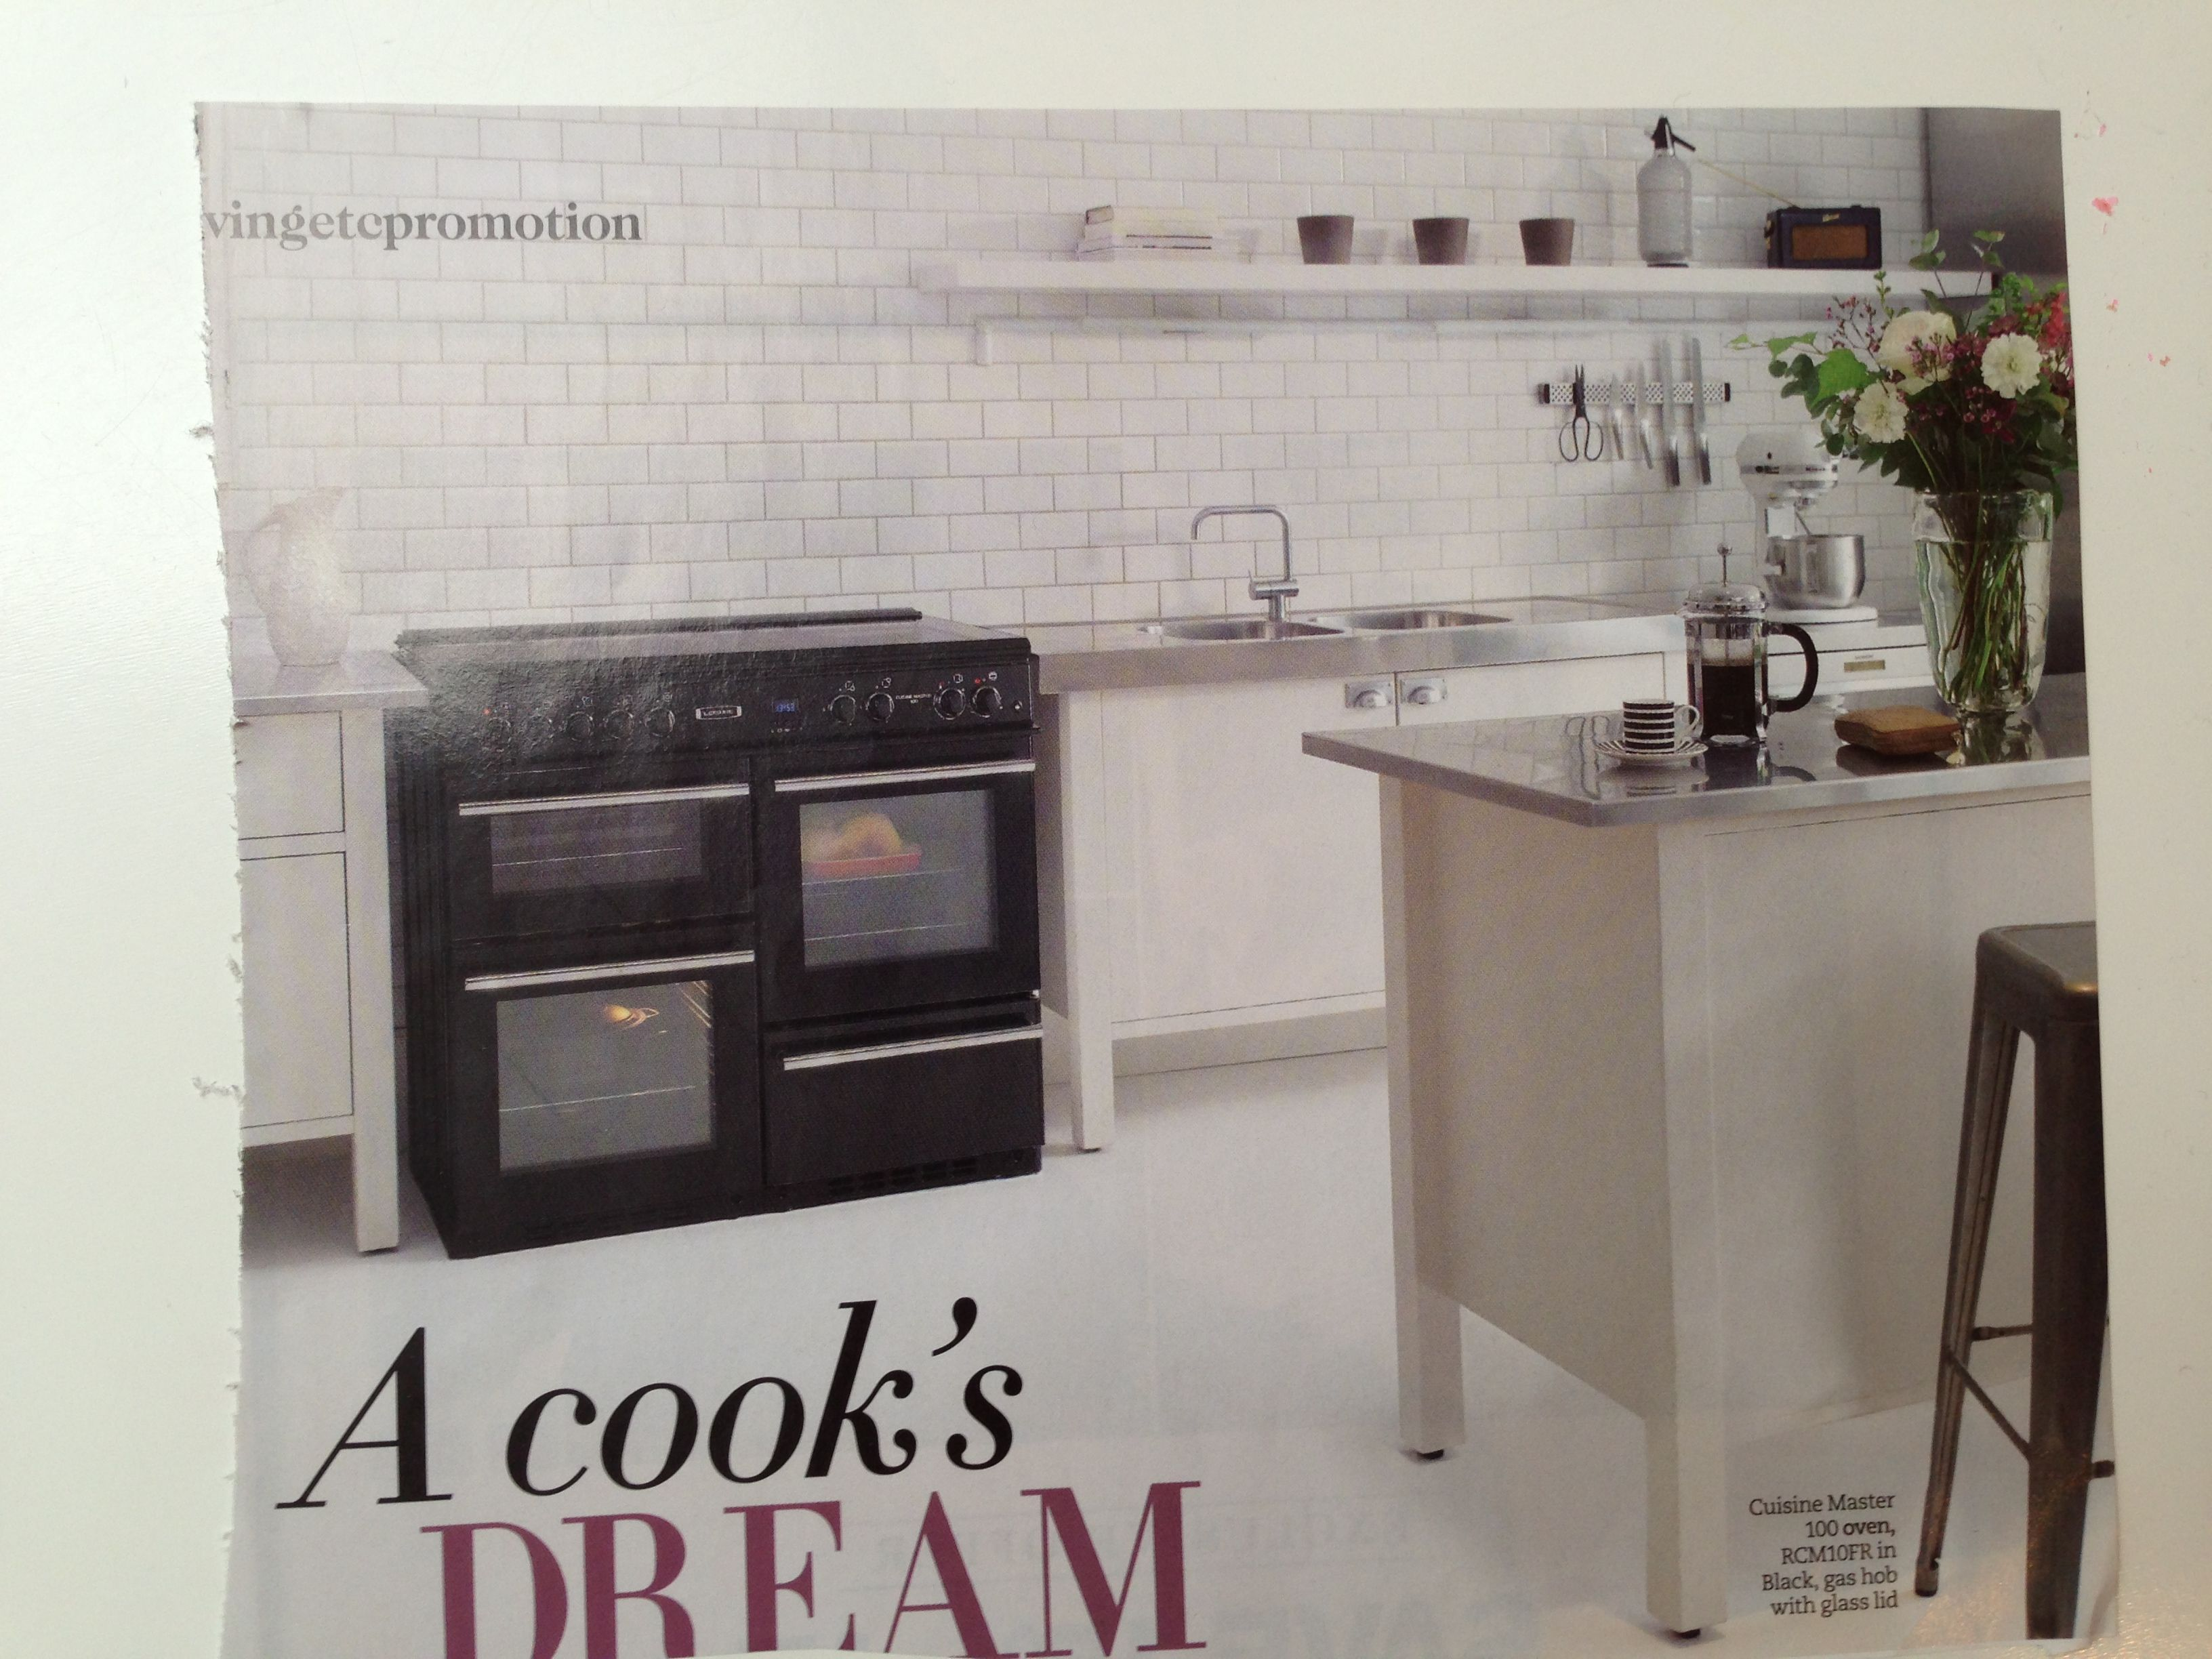 range cooker mmmm Kitchen, Range cooker, Kitchen